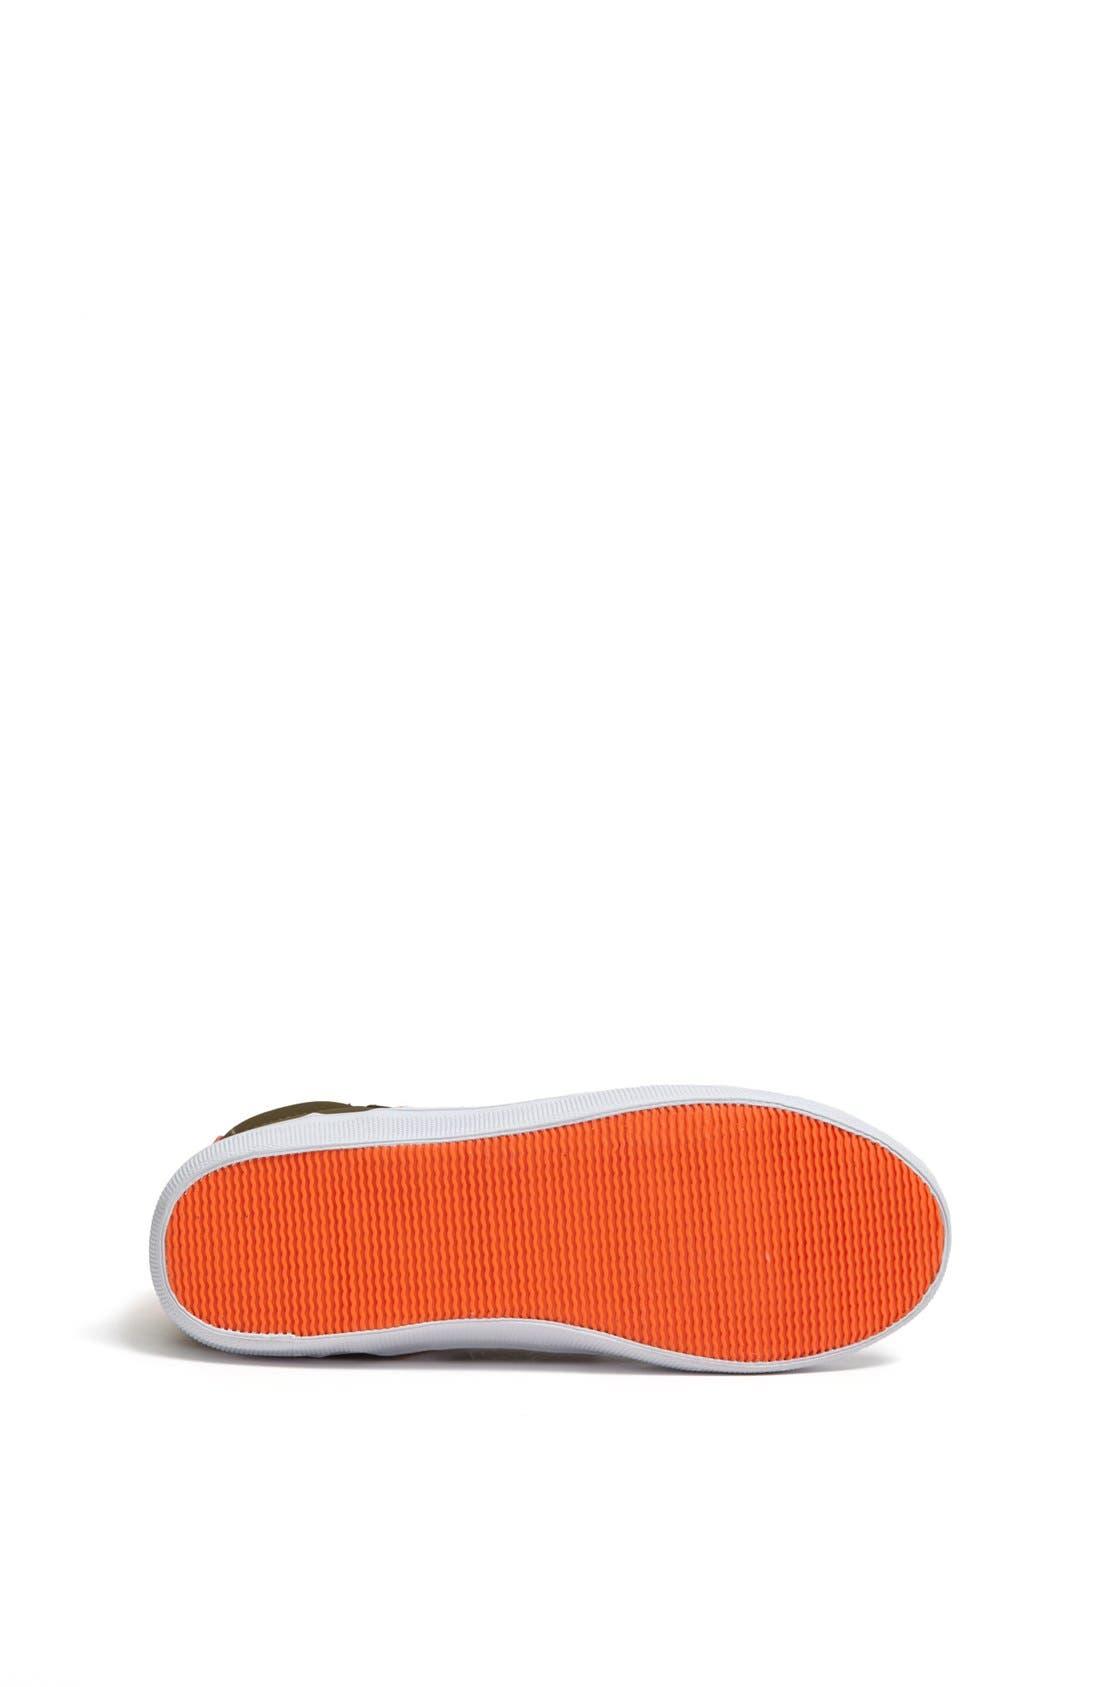 Alternate Image 4  - Lacoste 'Fairlead' High Top Sneaker (Toddler, Little Kid & Big Kid)